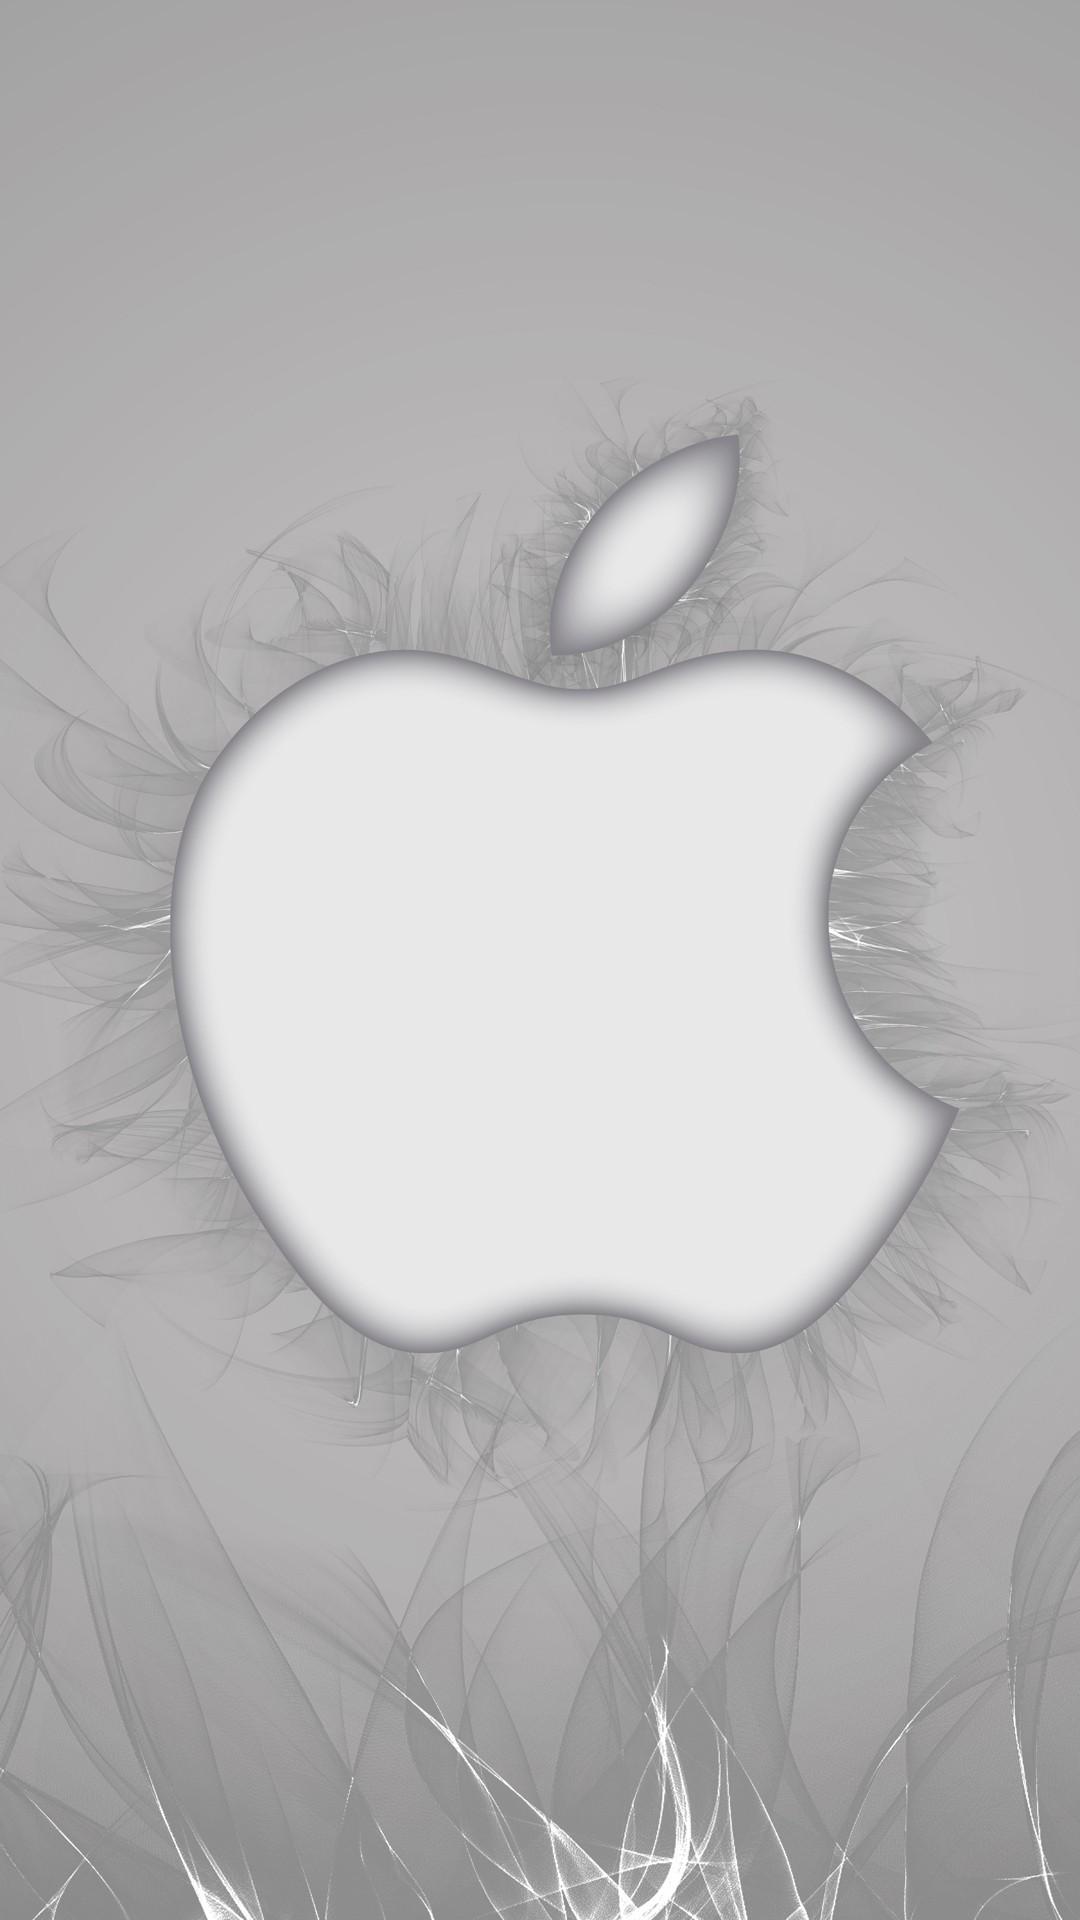 Gray iphone 8 plus wallpaper